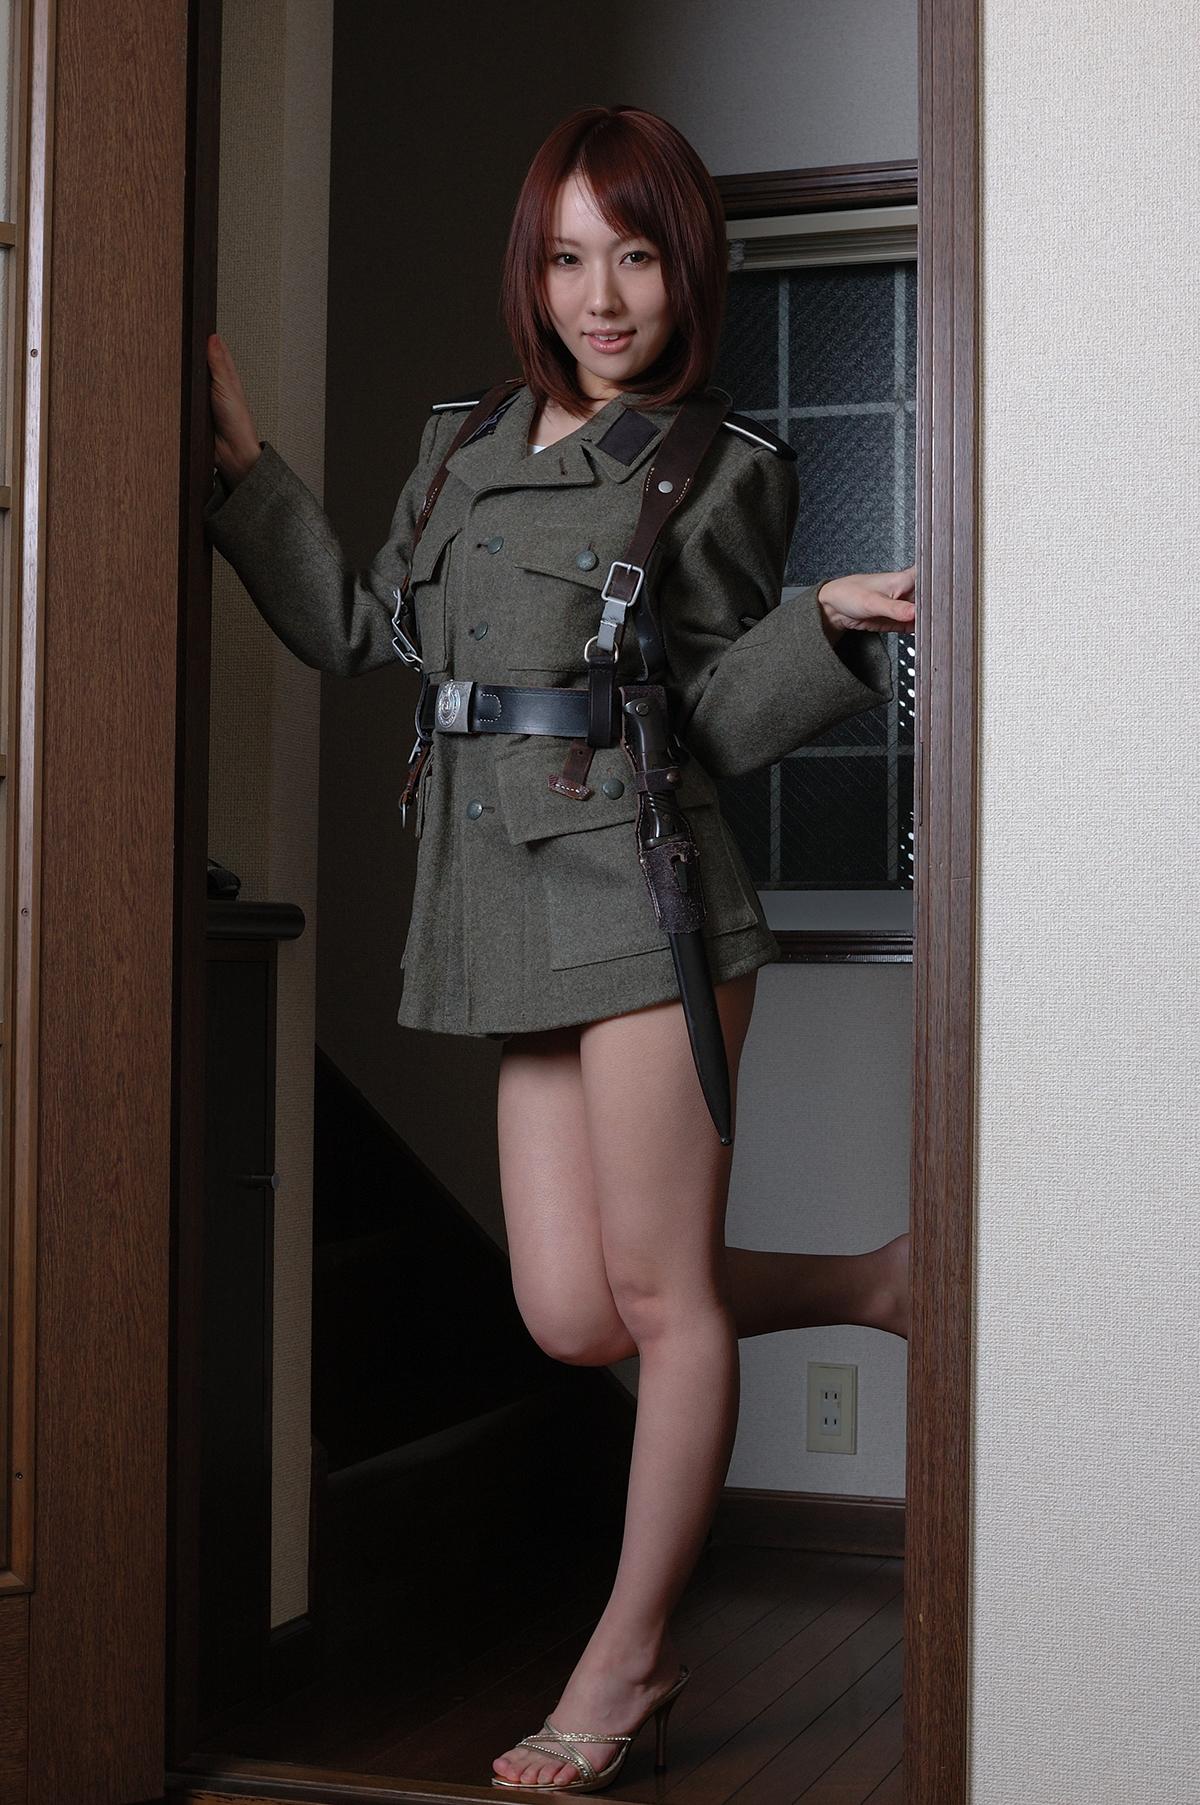 Kar98k銃剣/実物